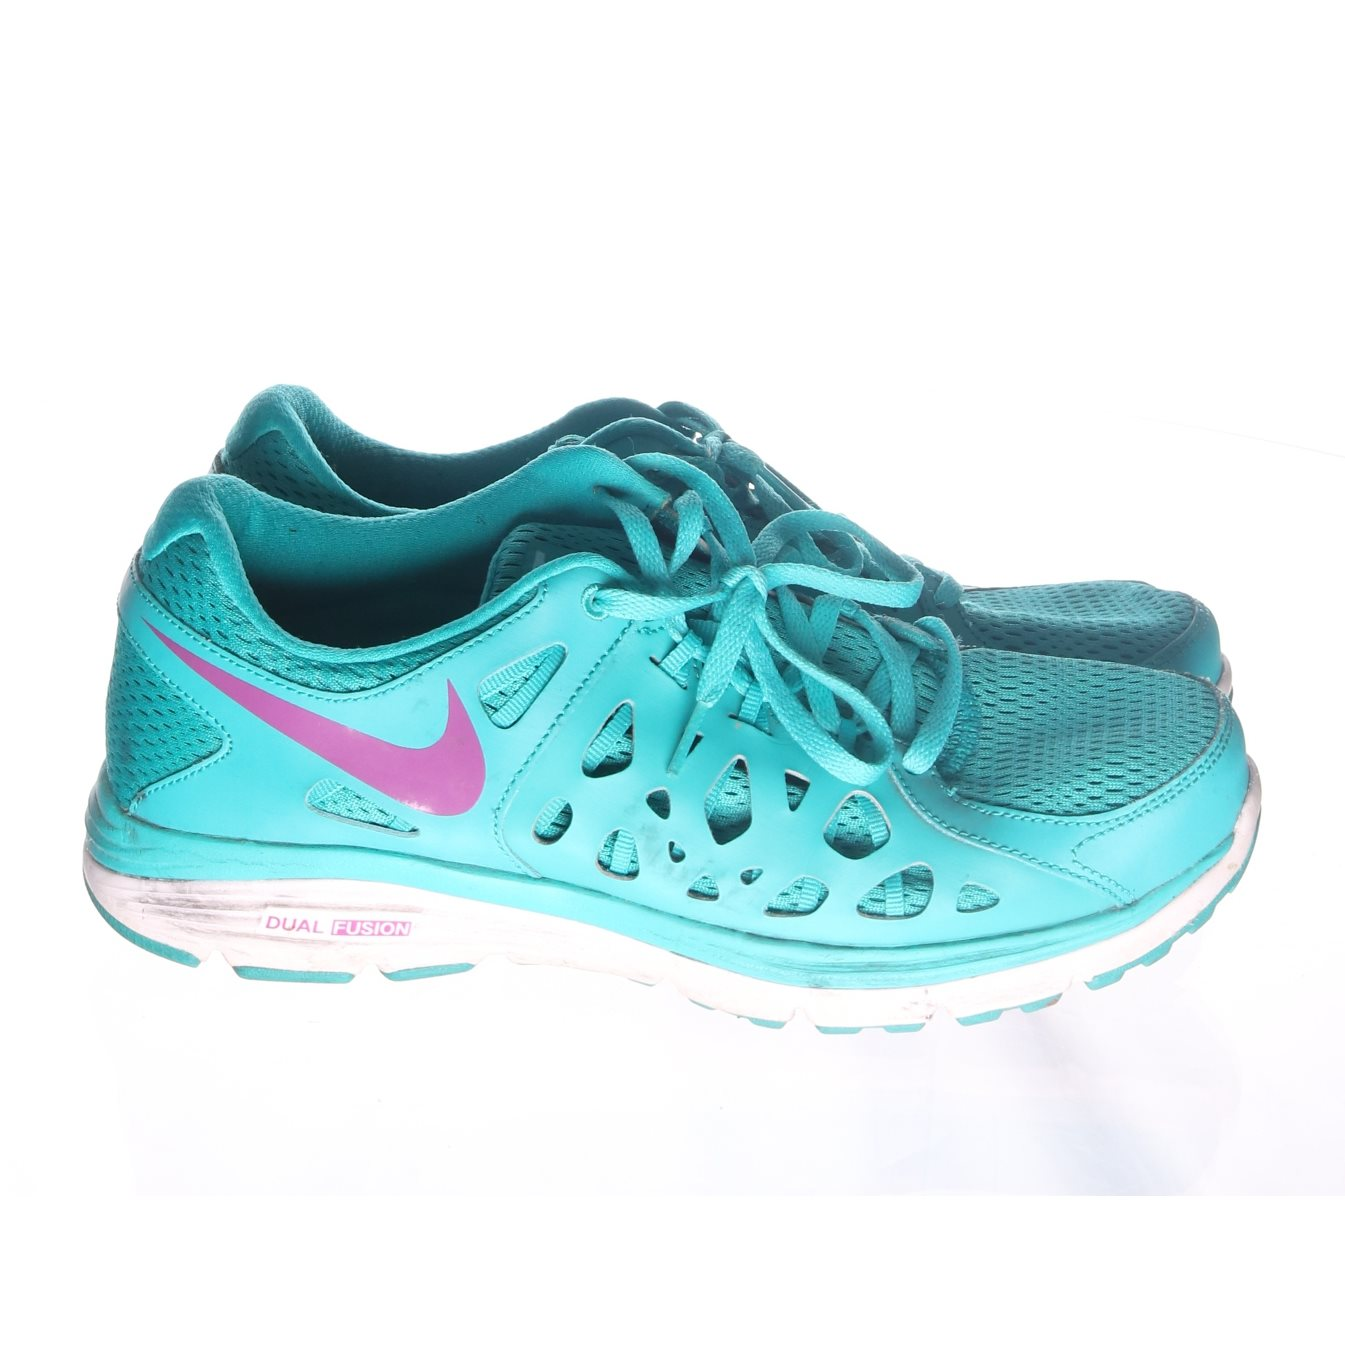 new concept 529f9 c4a40 Strl Nike Fusion 41 2 Dual Skor 315039380 Run RqFvw